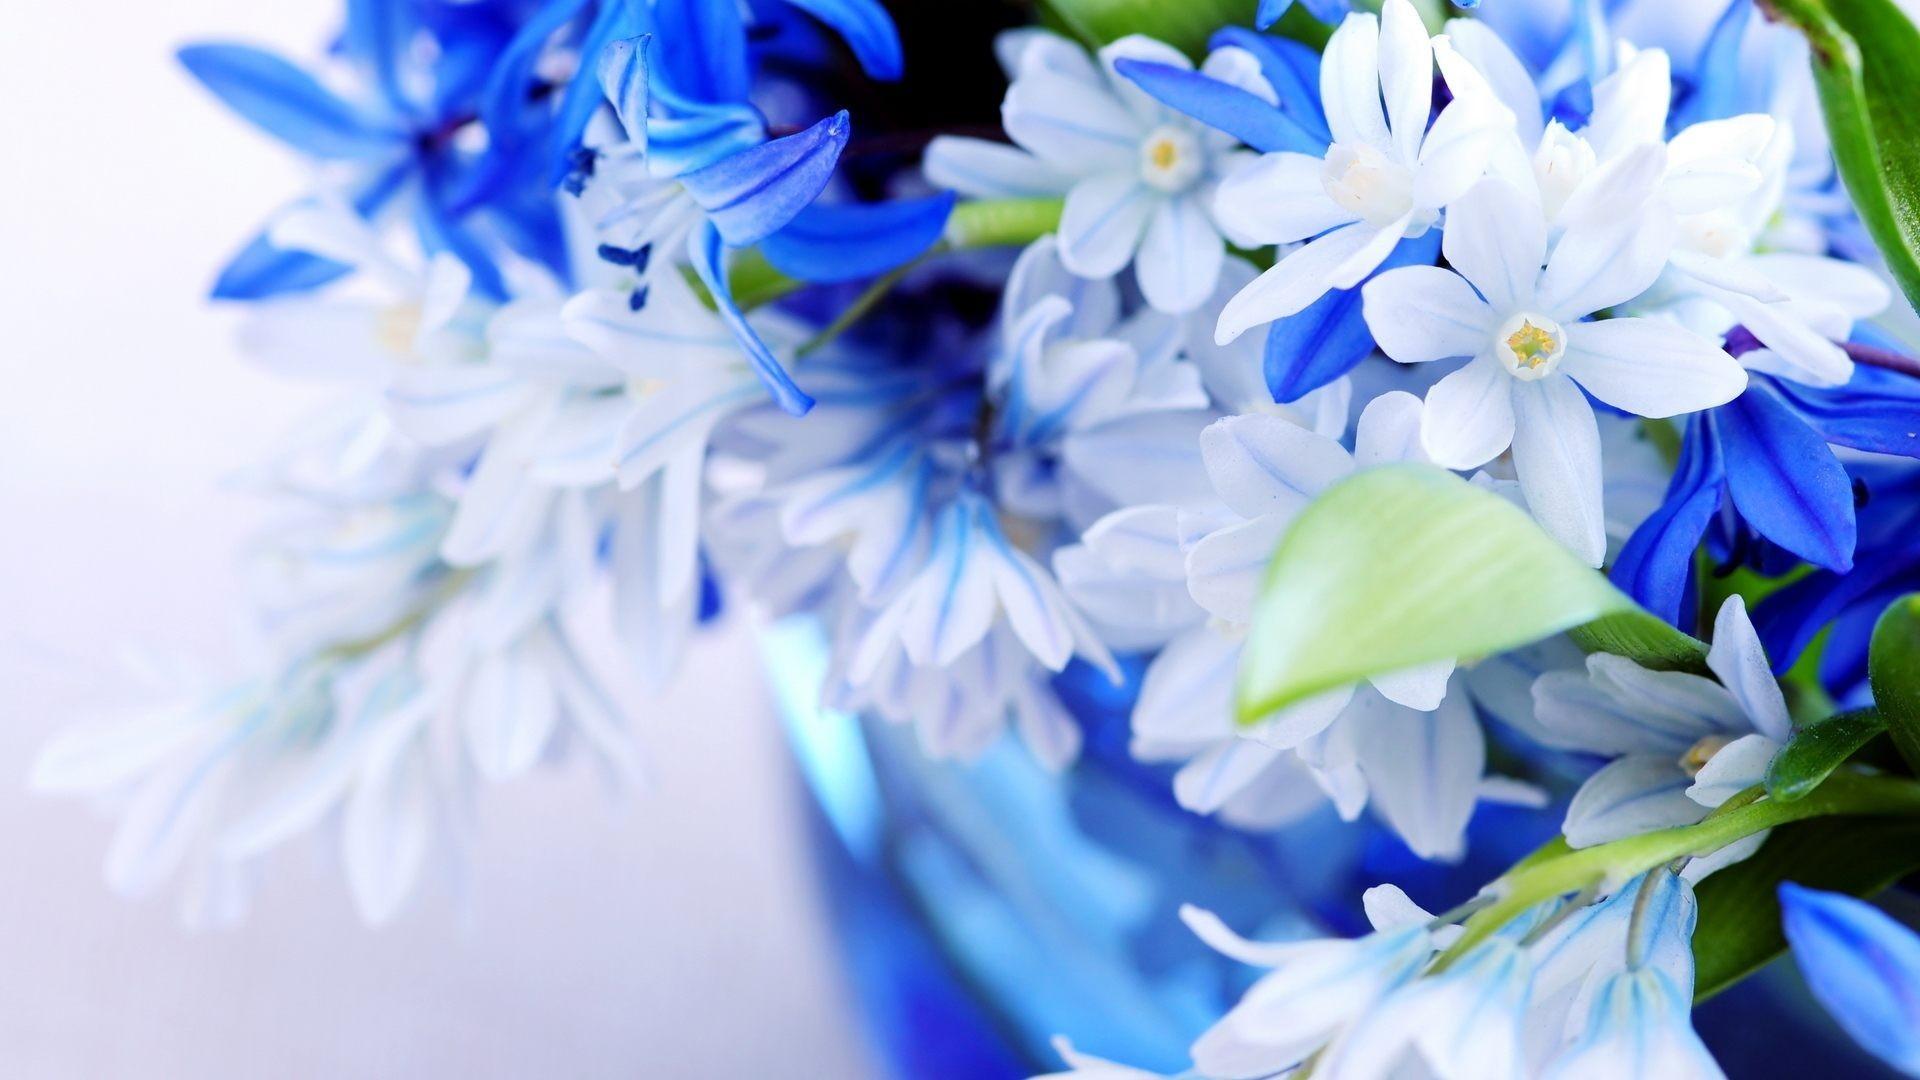 Blue Flower Background For Desktop Wallpaper